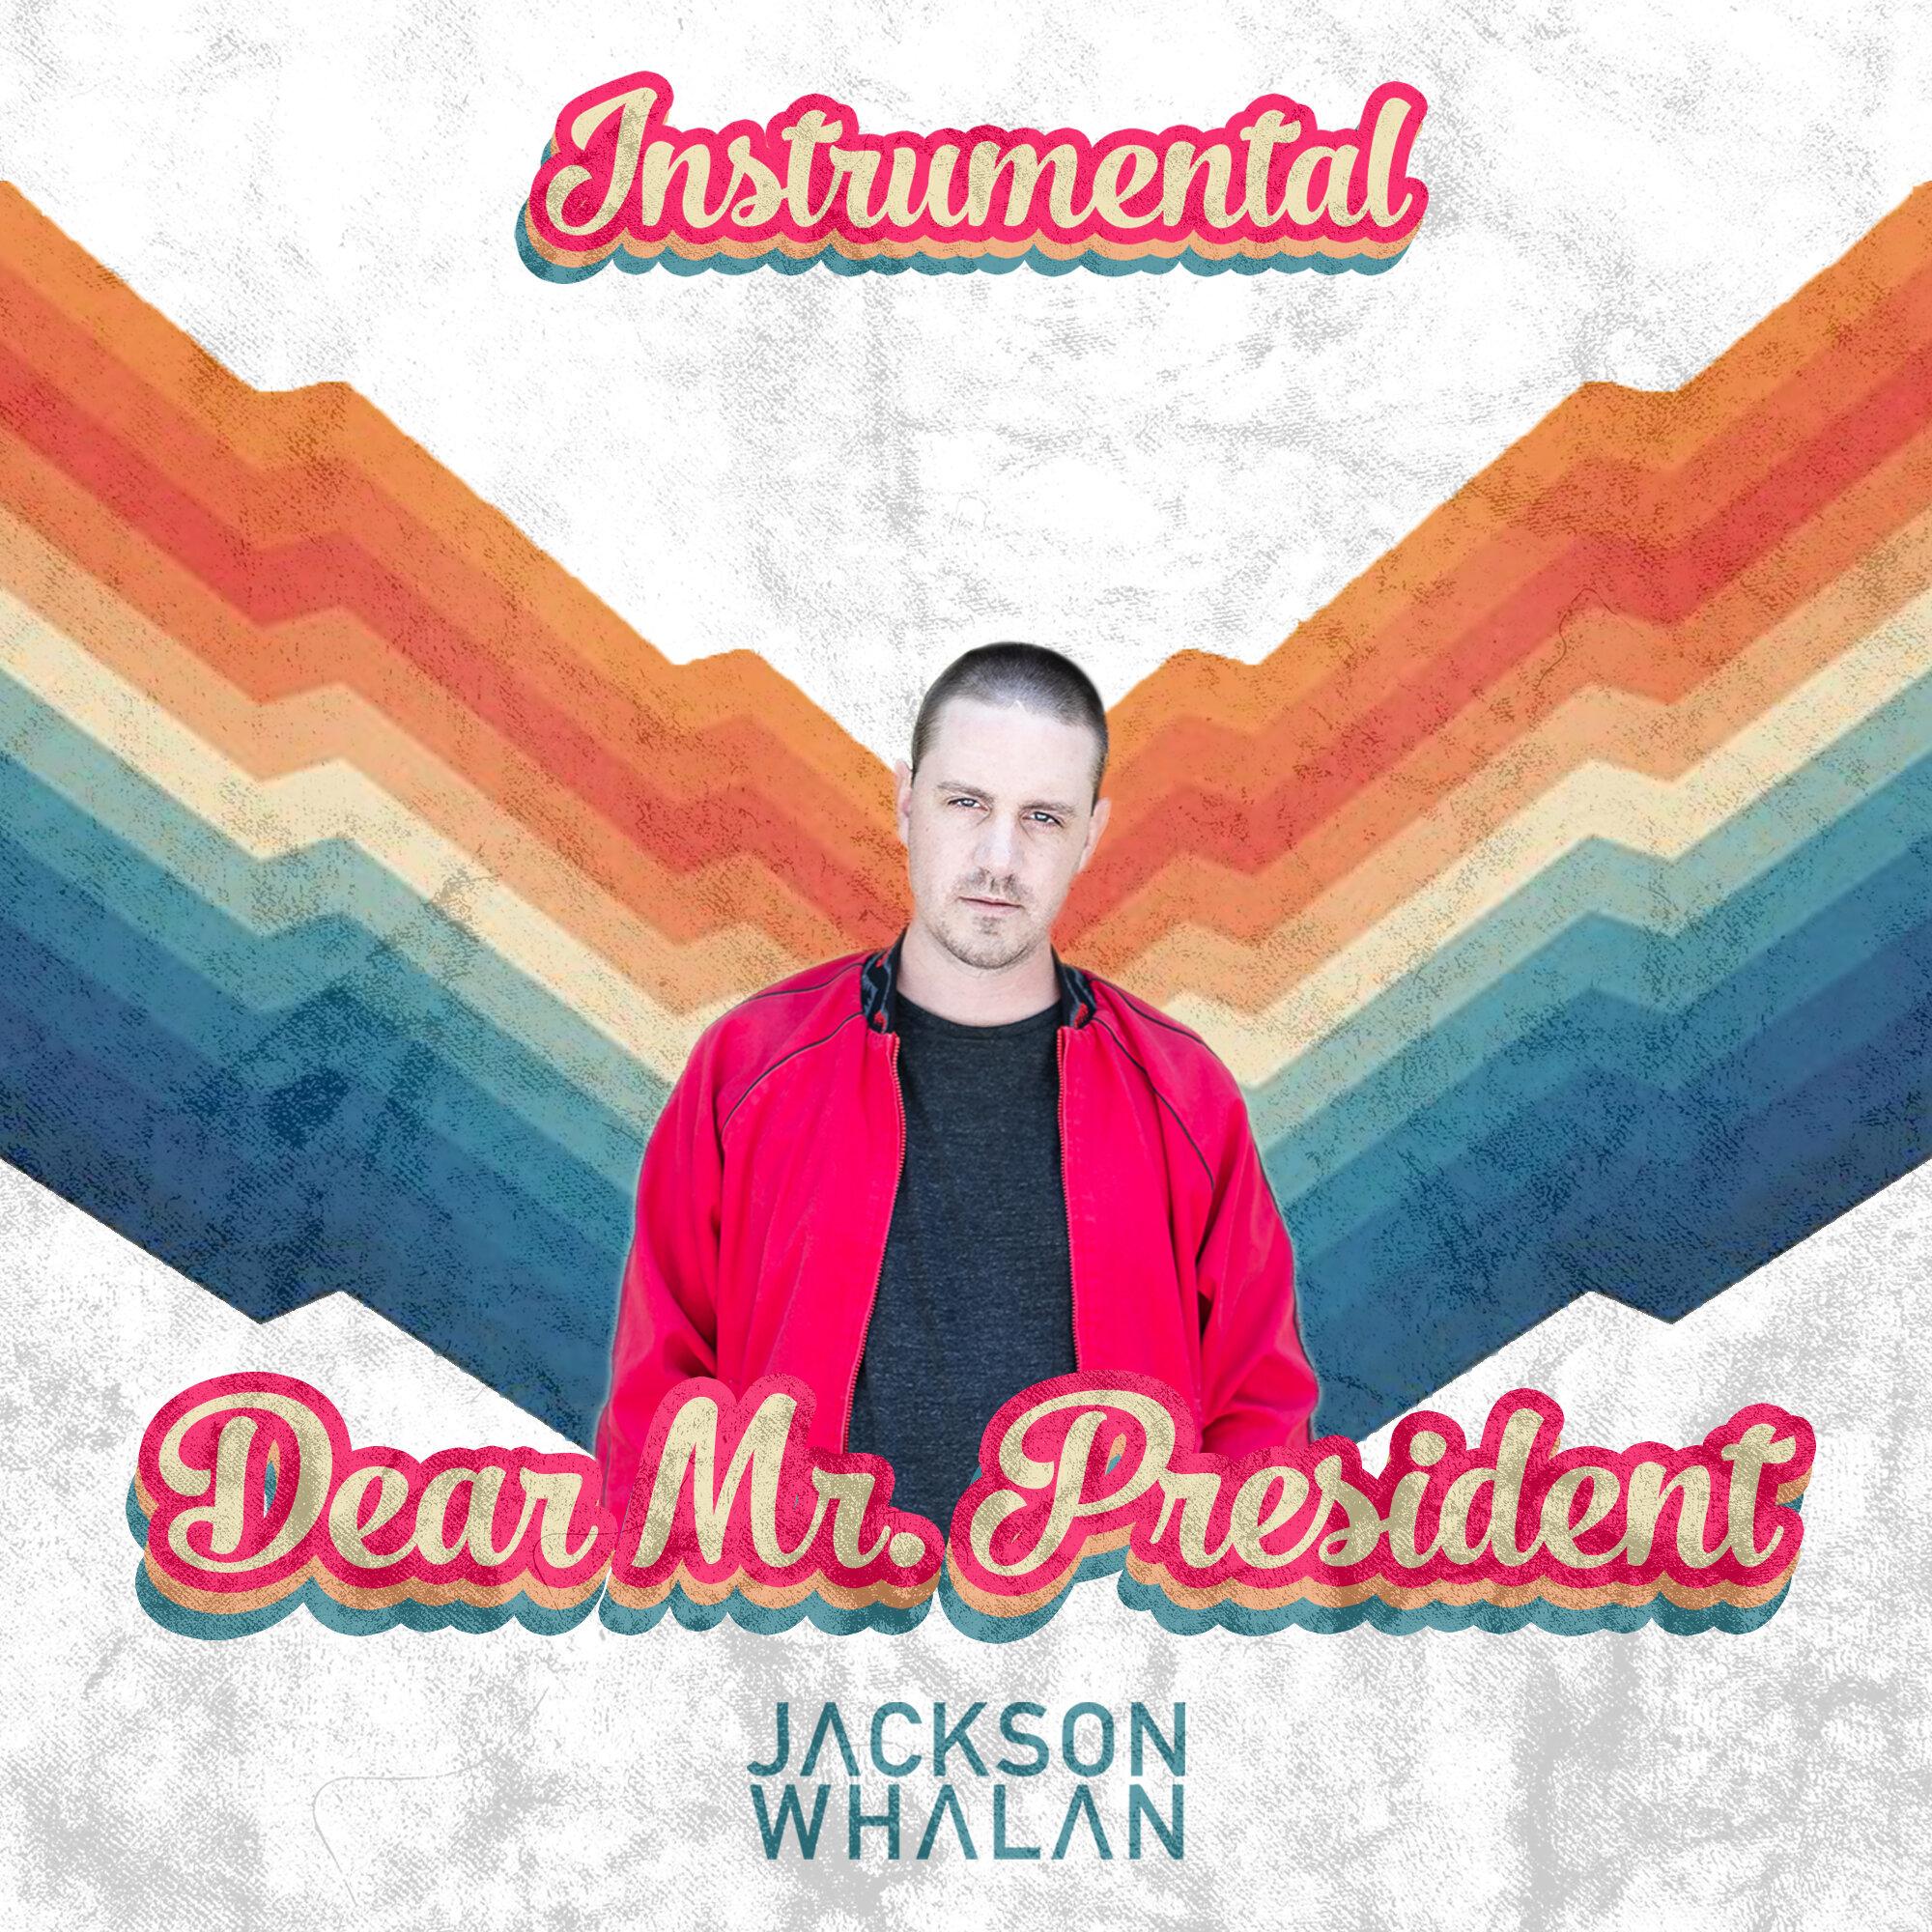 Dear-Mr-President-Instrumental